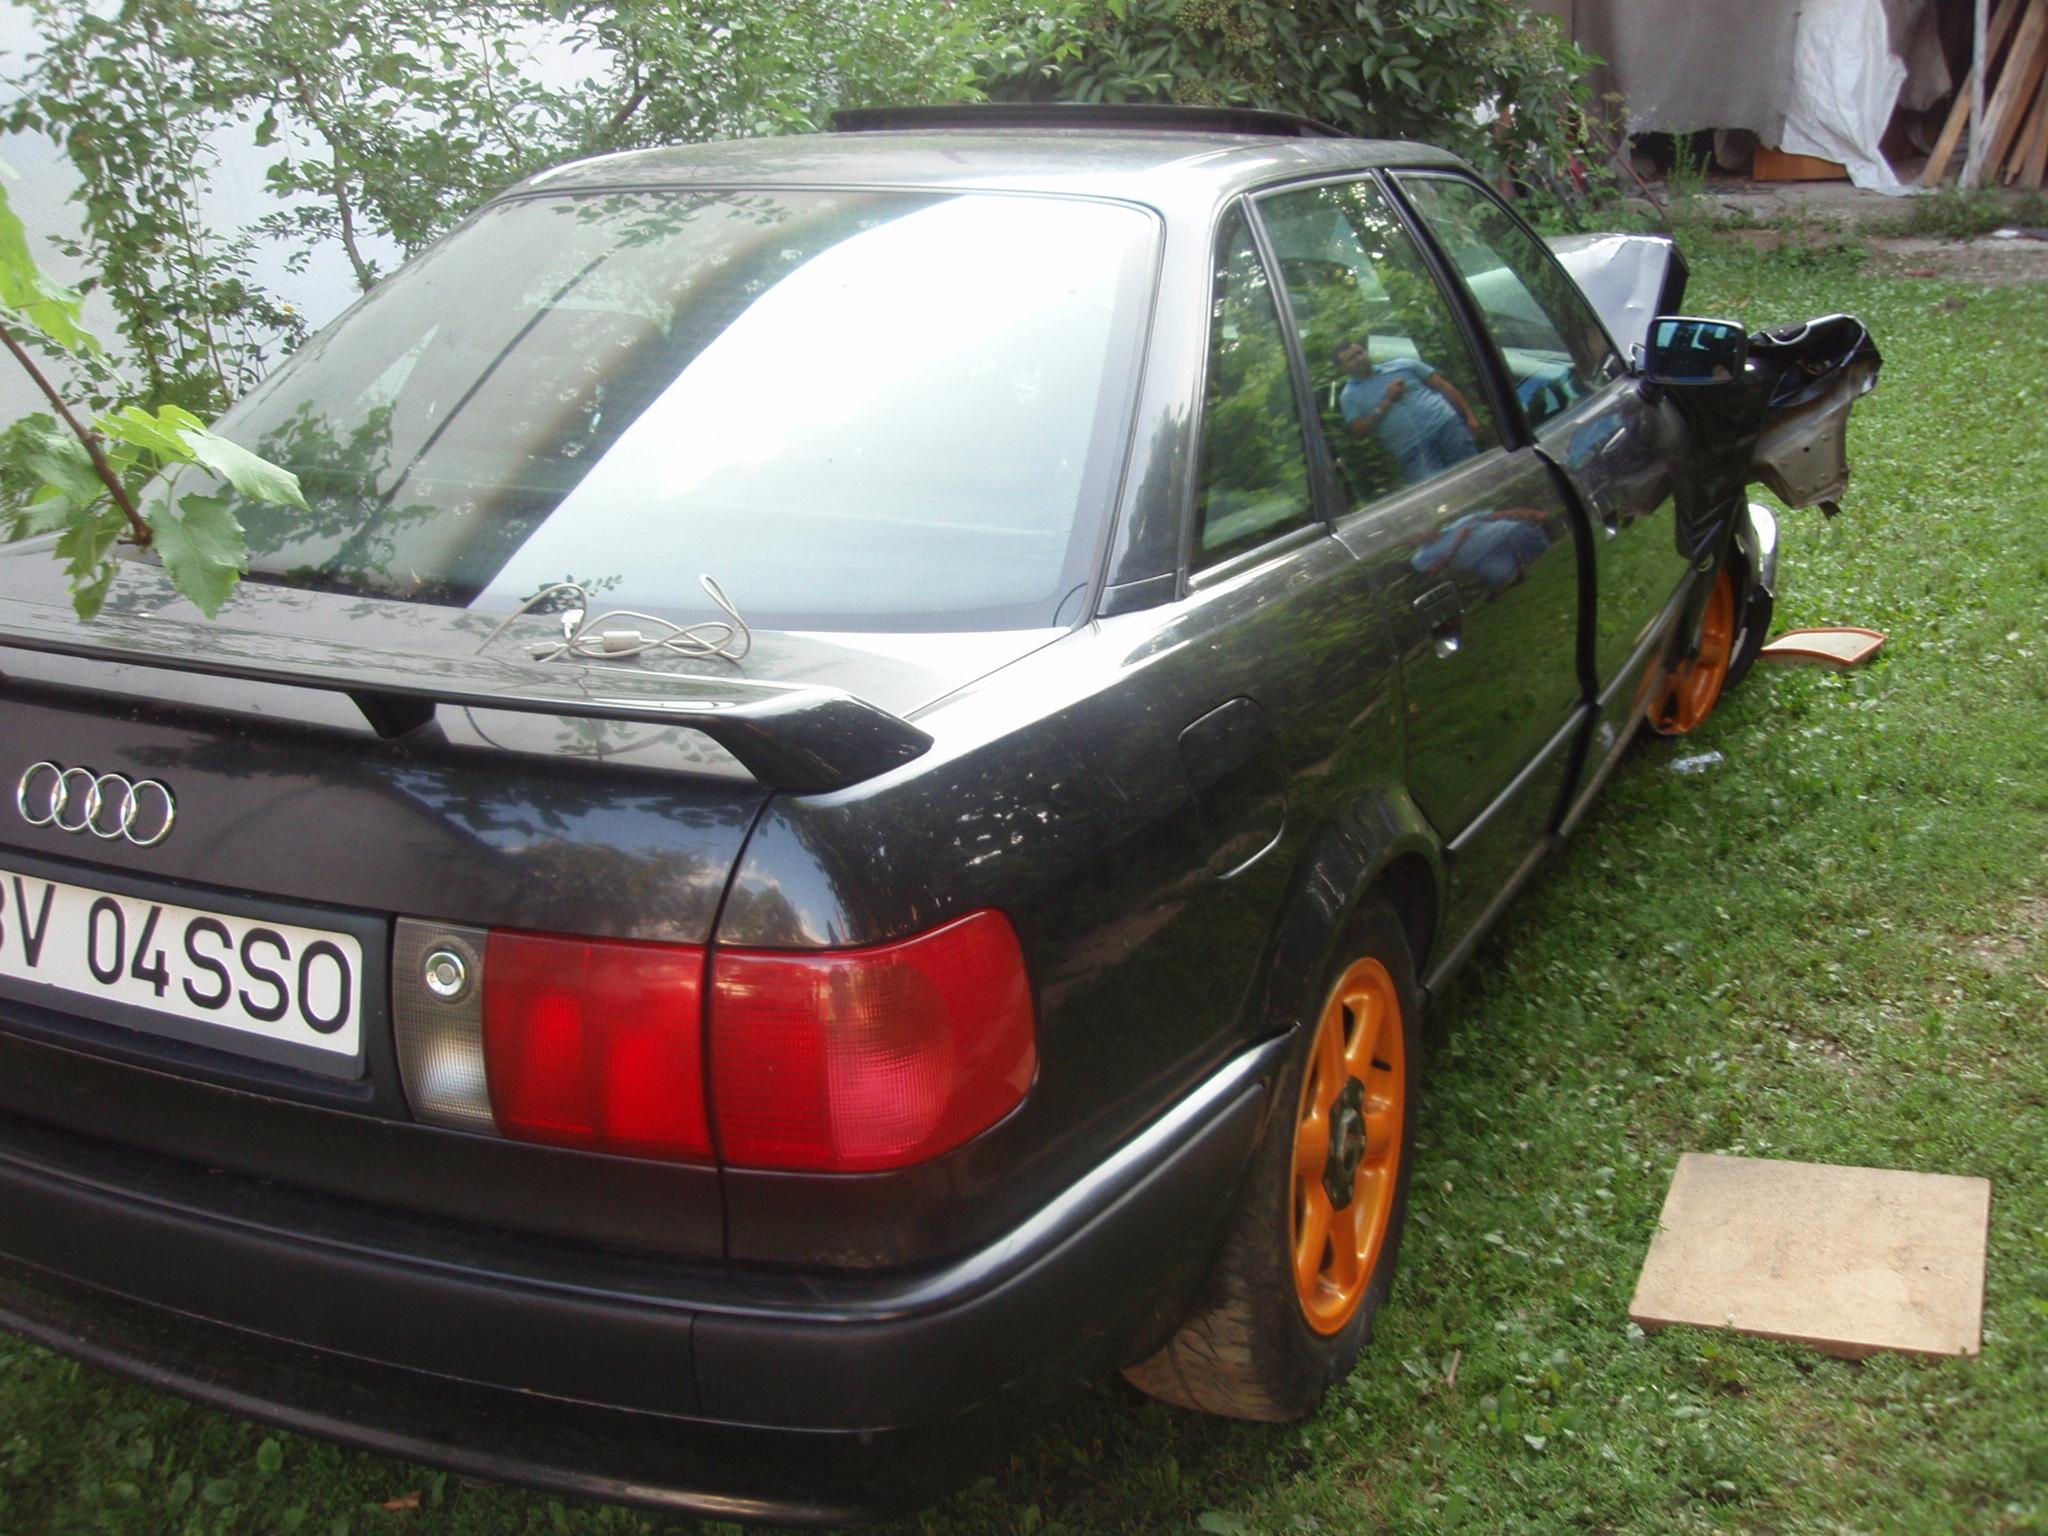 Audi 80 avariat 1993 Benzina Berlina - 25 Iulie 2011 - Poza 1